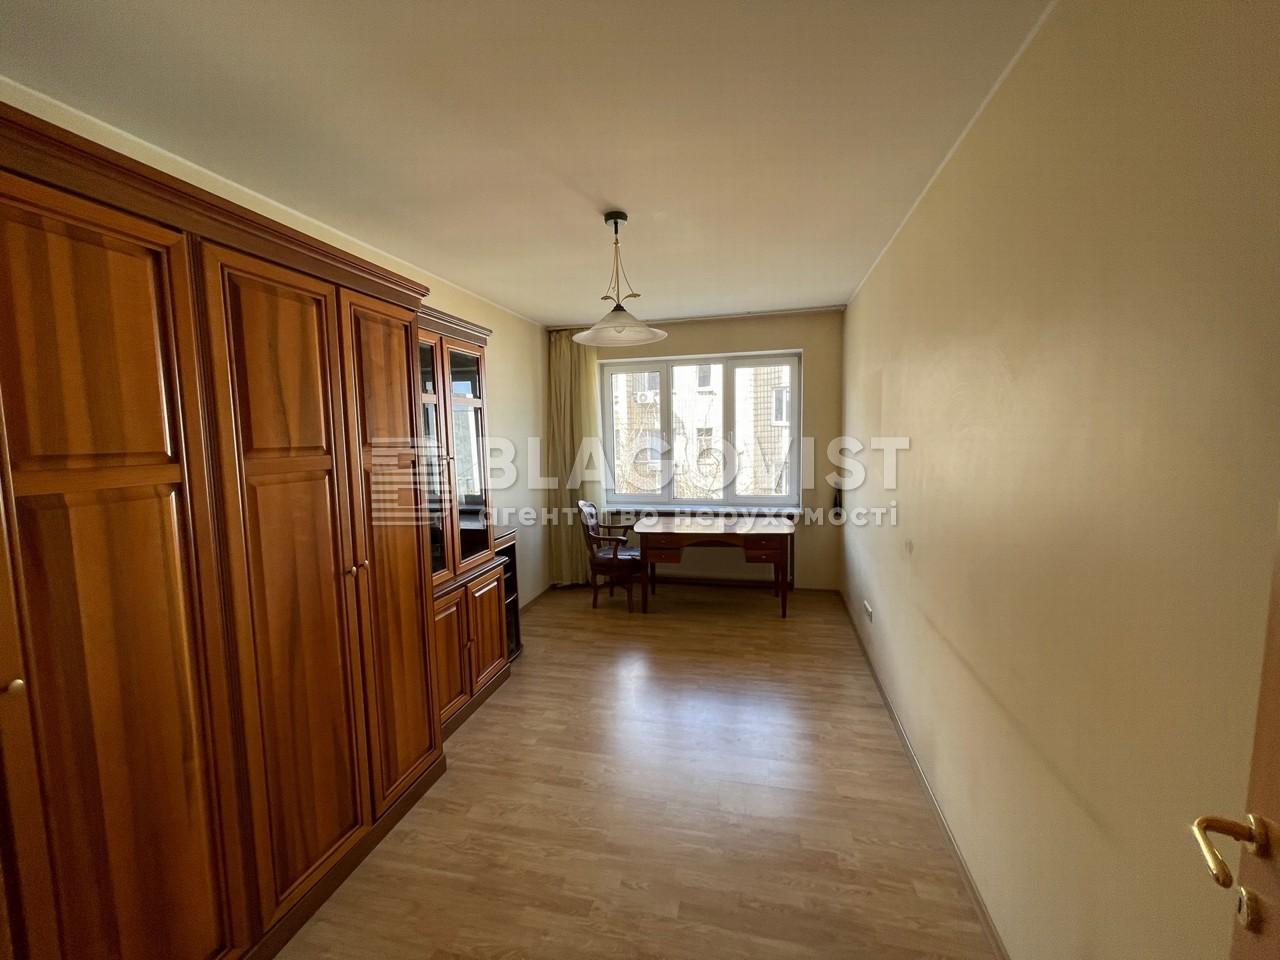 Квартира E-40979, Гордиенко Костя пер. (Чекистов пер.), 2а, Киев - Фото 12